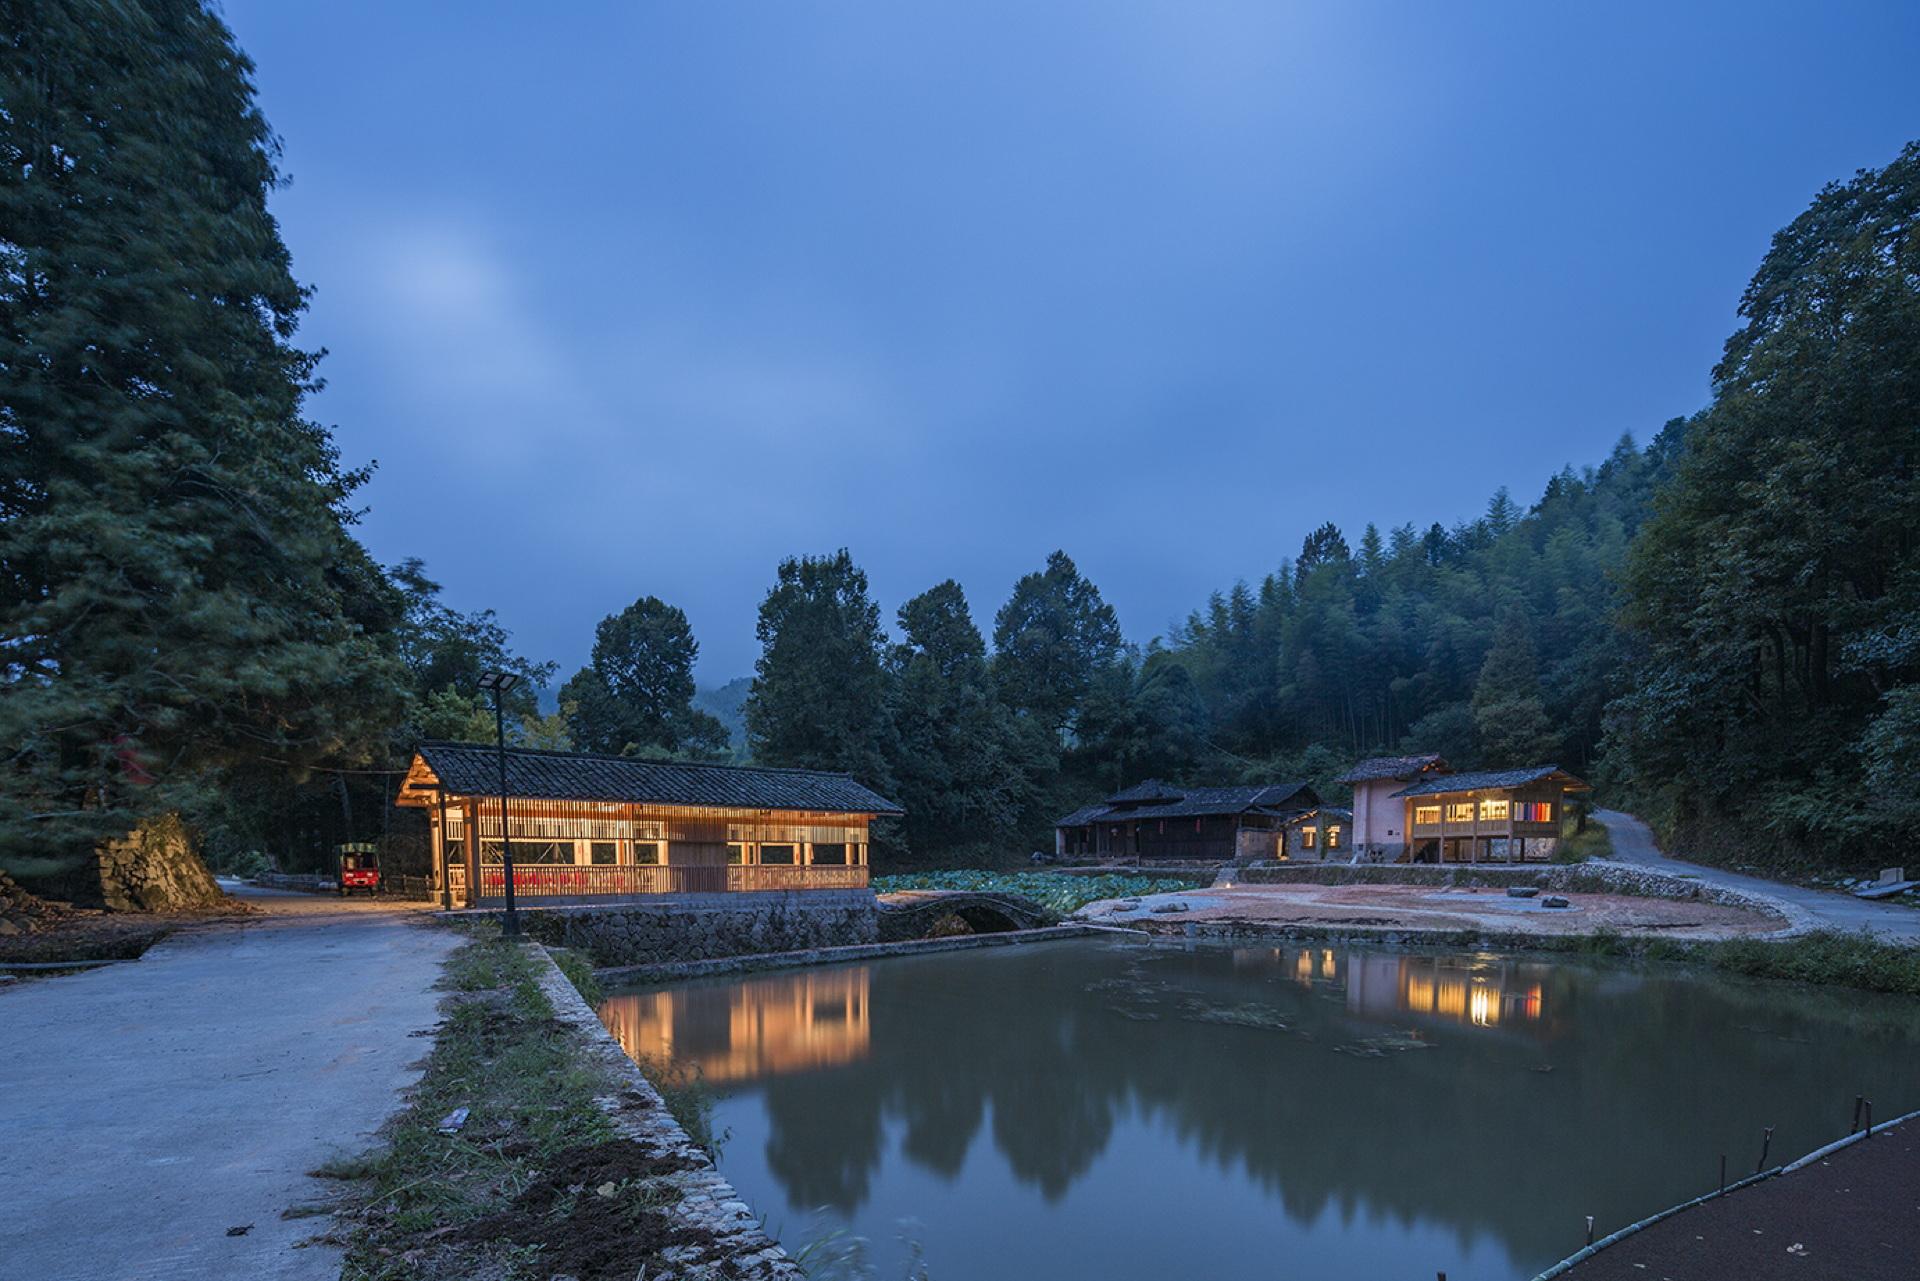 He Wei: Shangping Village Regeneration